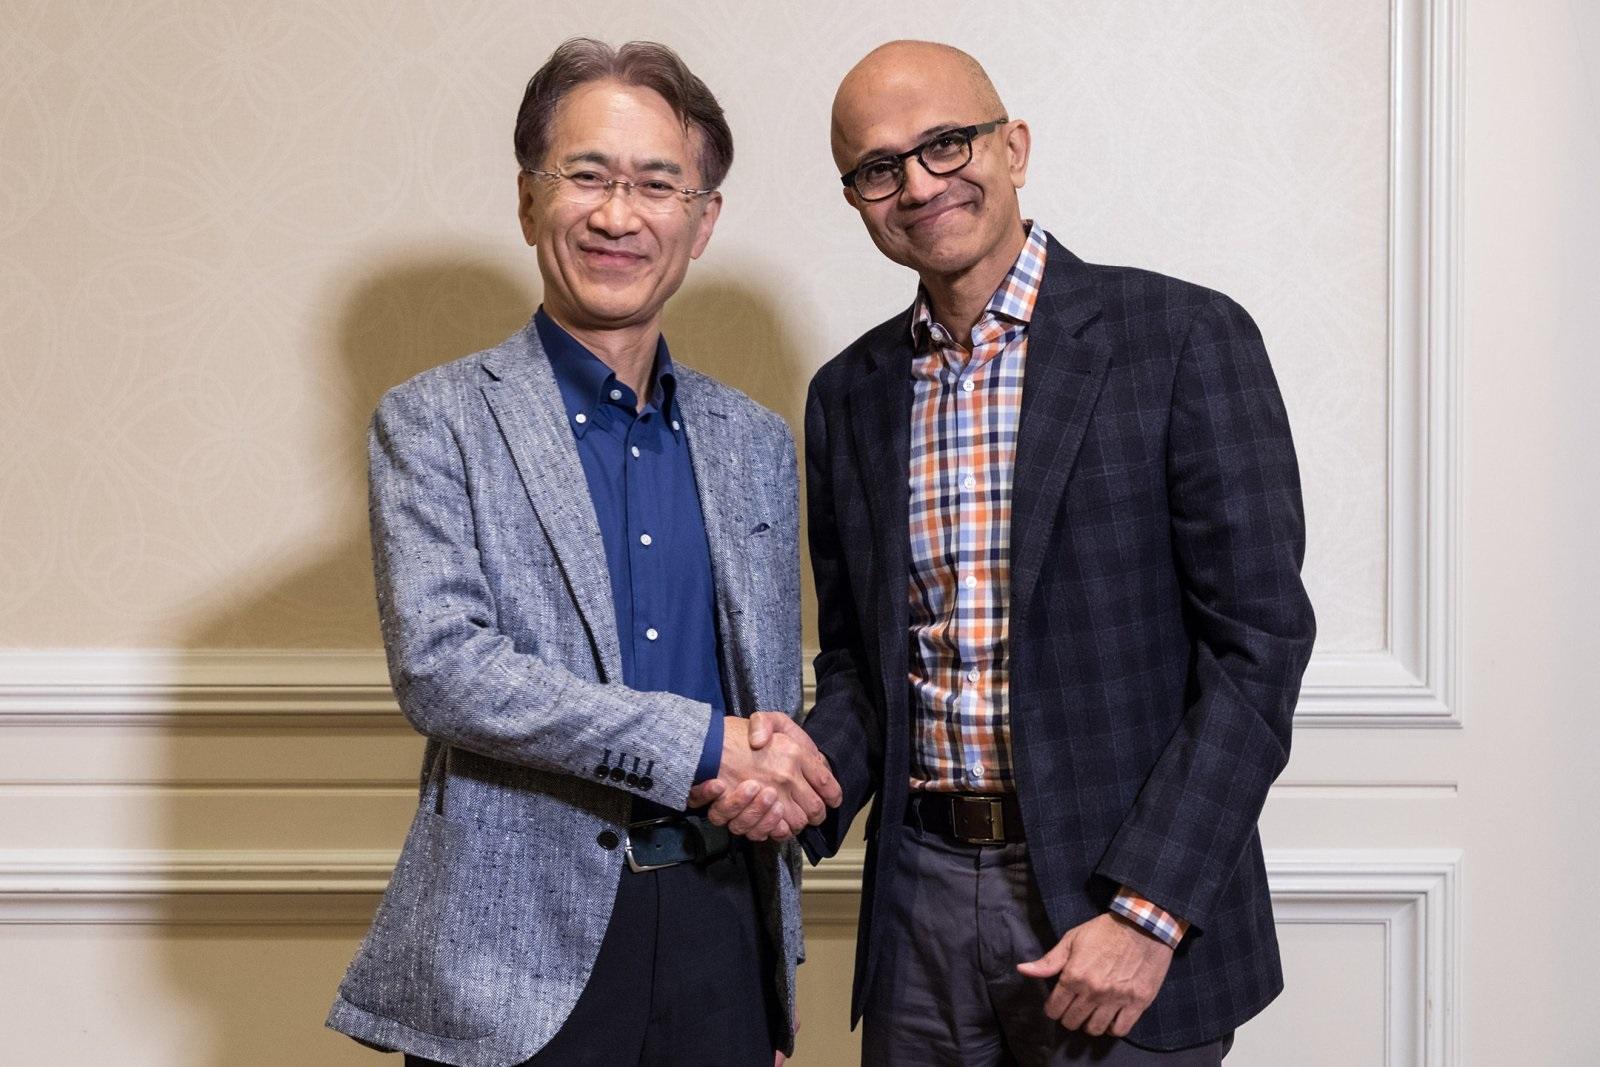 Microsoft a Sony spolupráce; screenshot: Satya Nadella, Kenichiro Yoshida